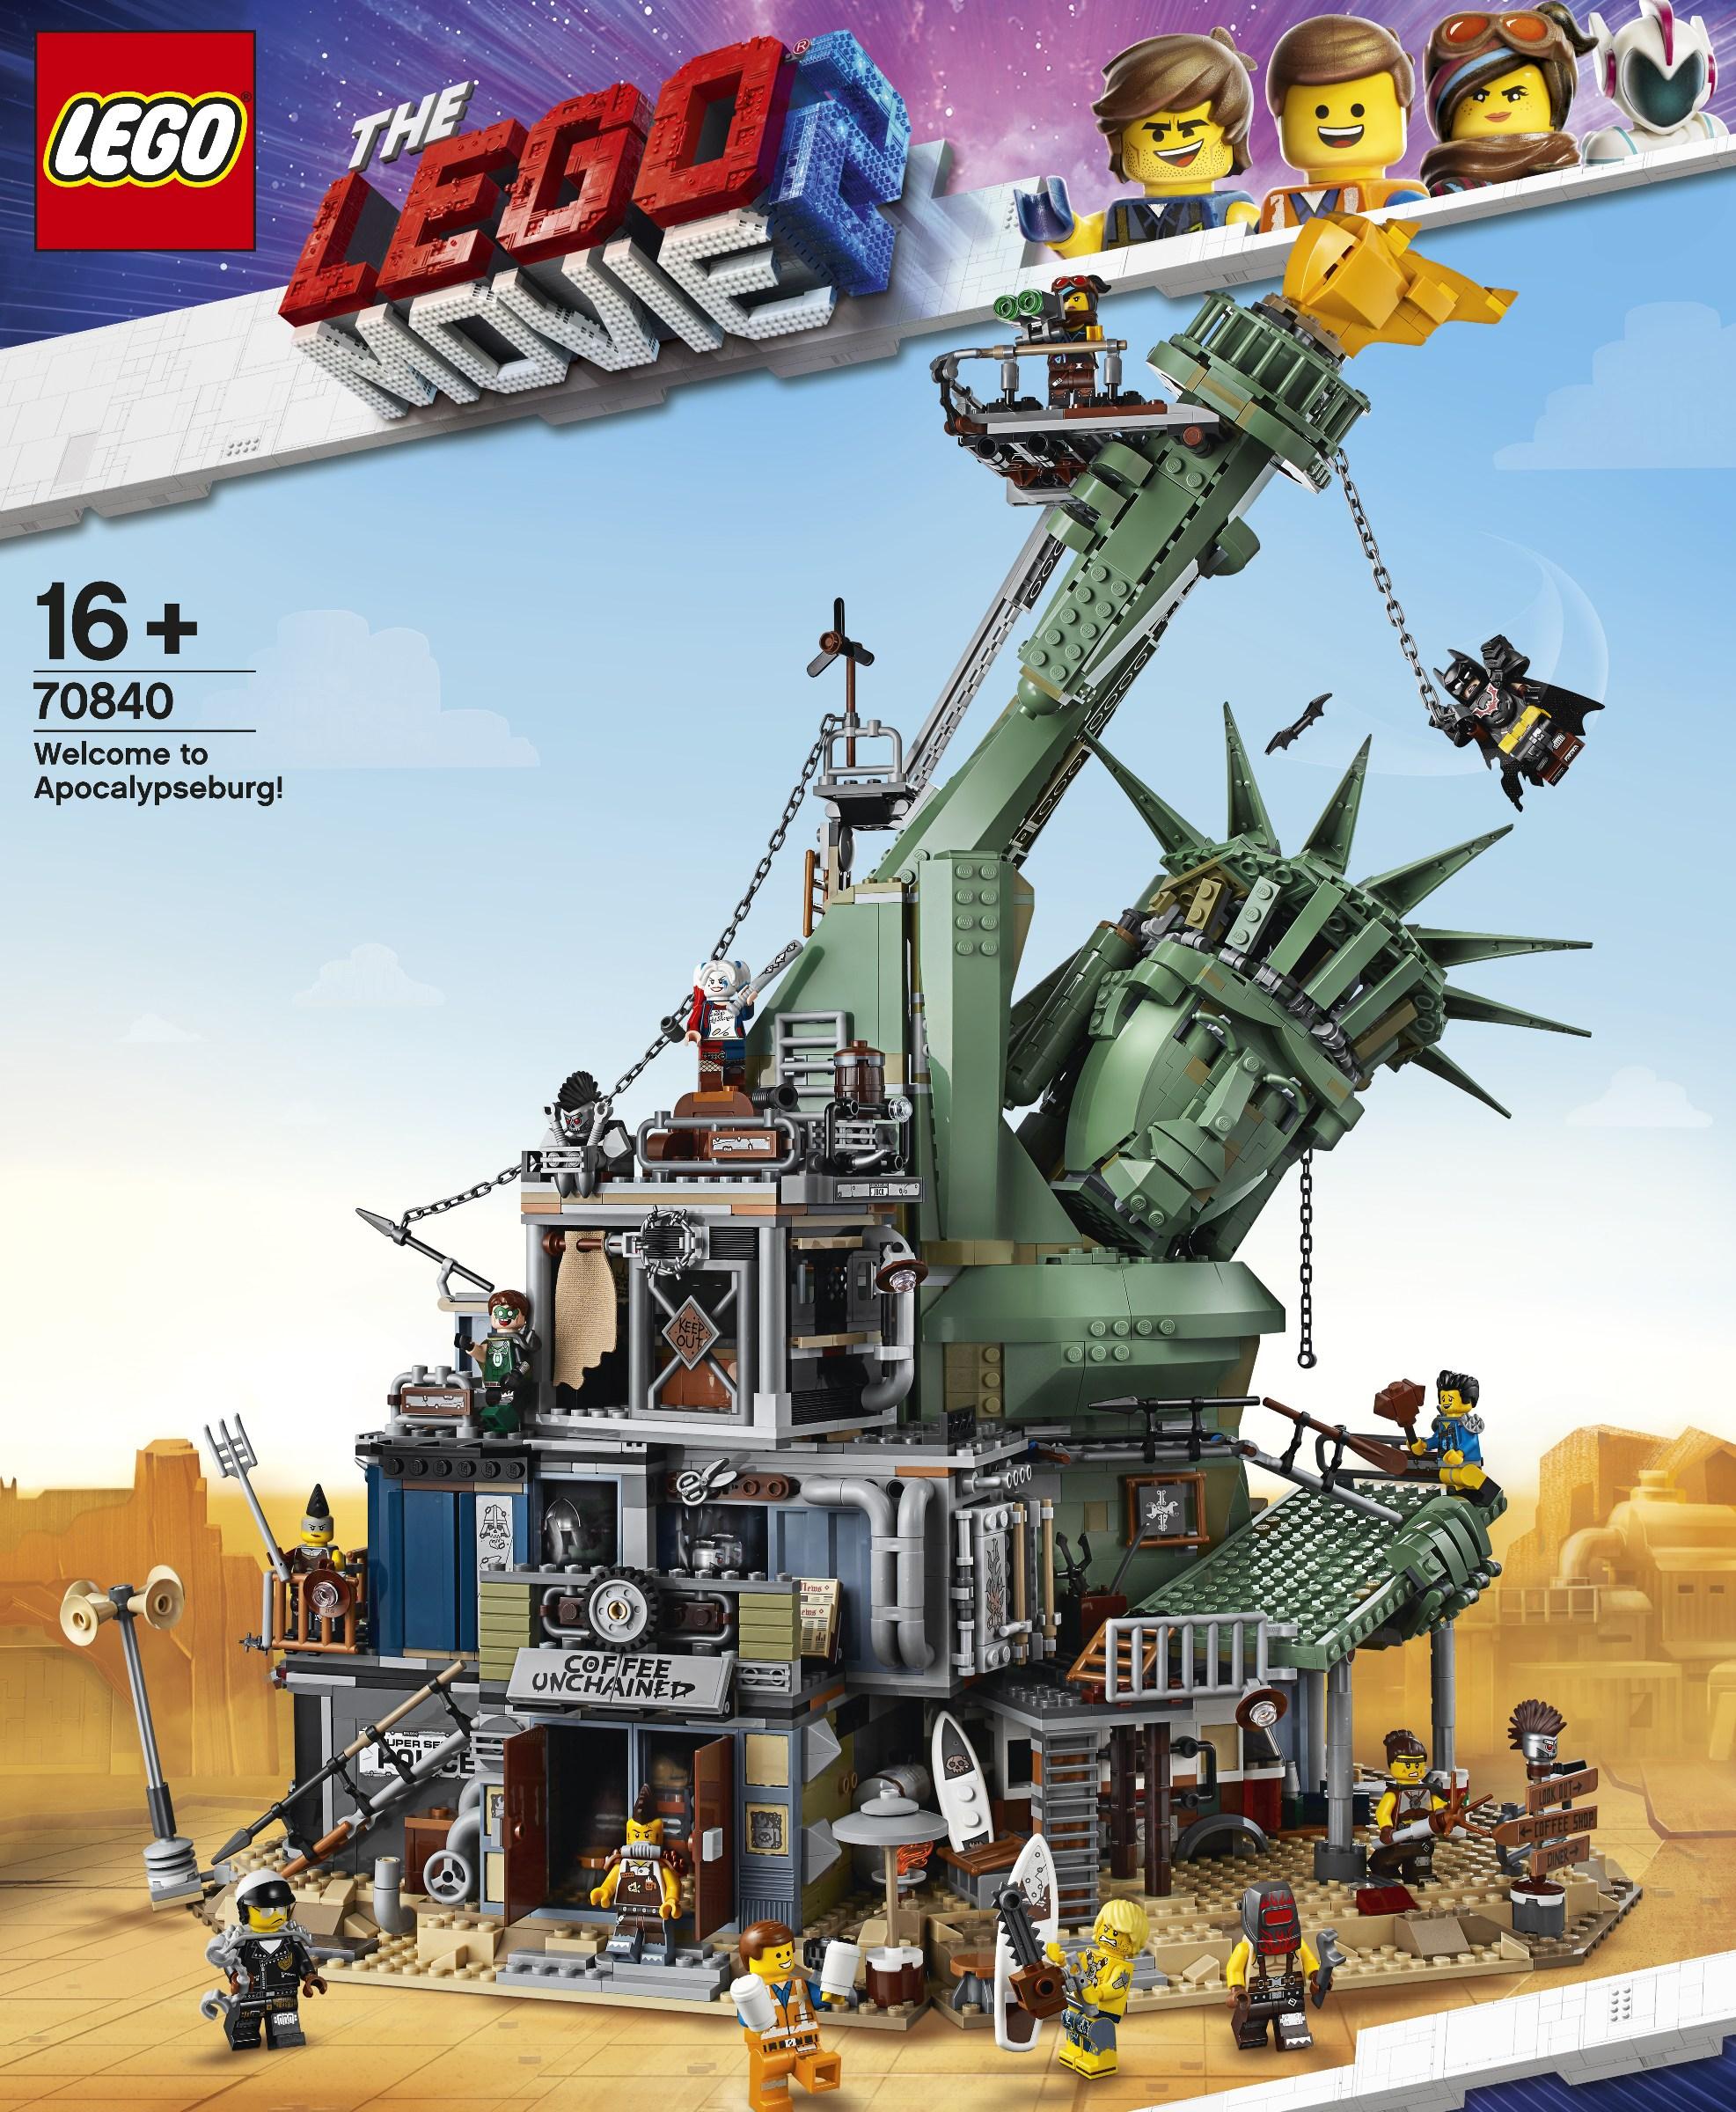 szmk_lego_movie_2_apocalypseburg_set_9.jpg